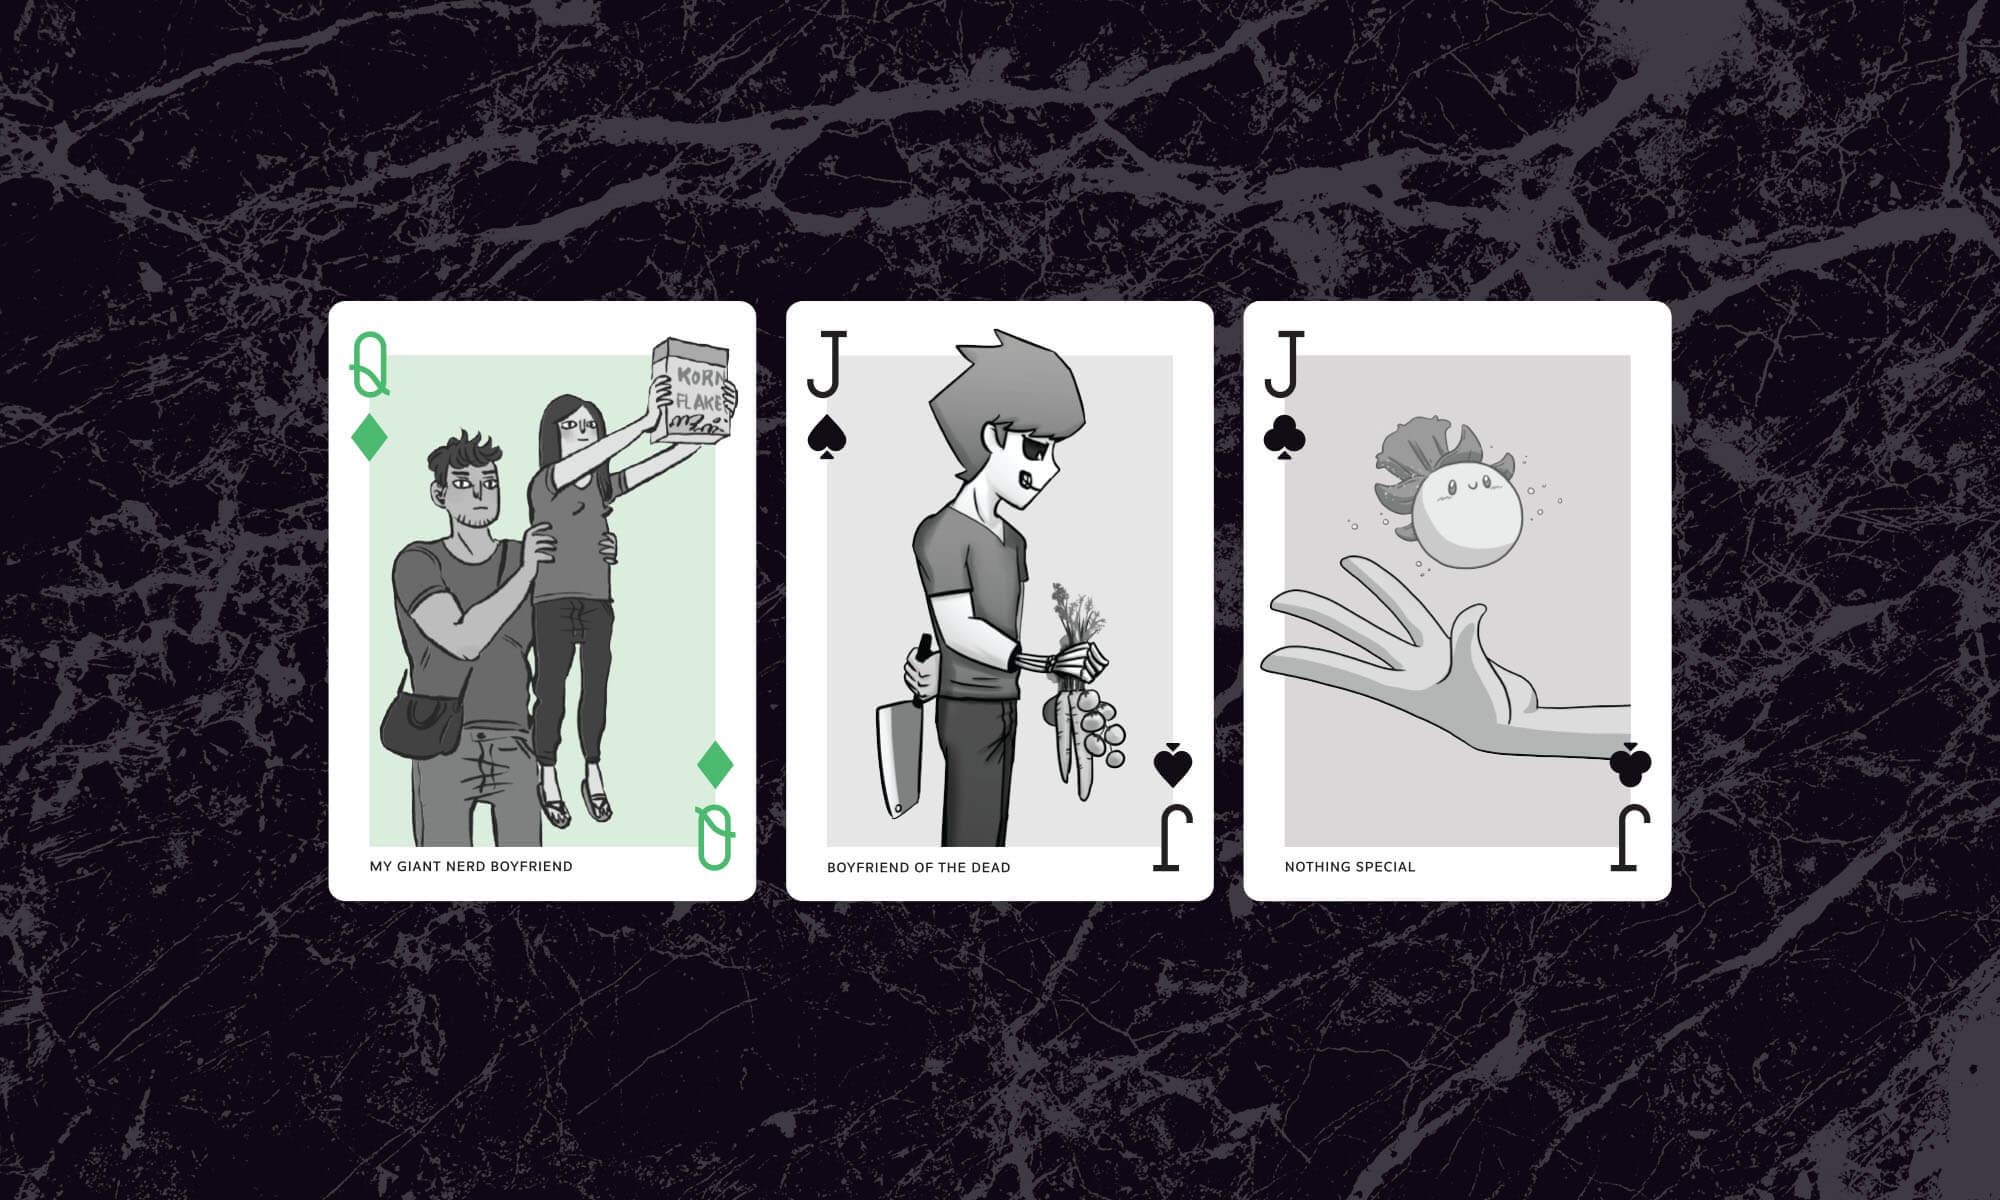 studio-malagon-green-room-cards-03.jpg